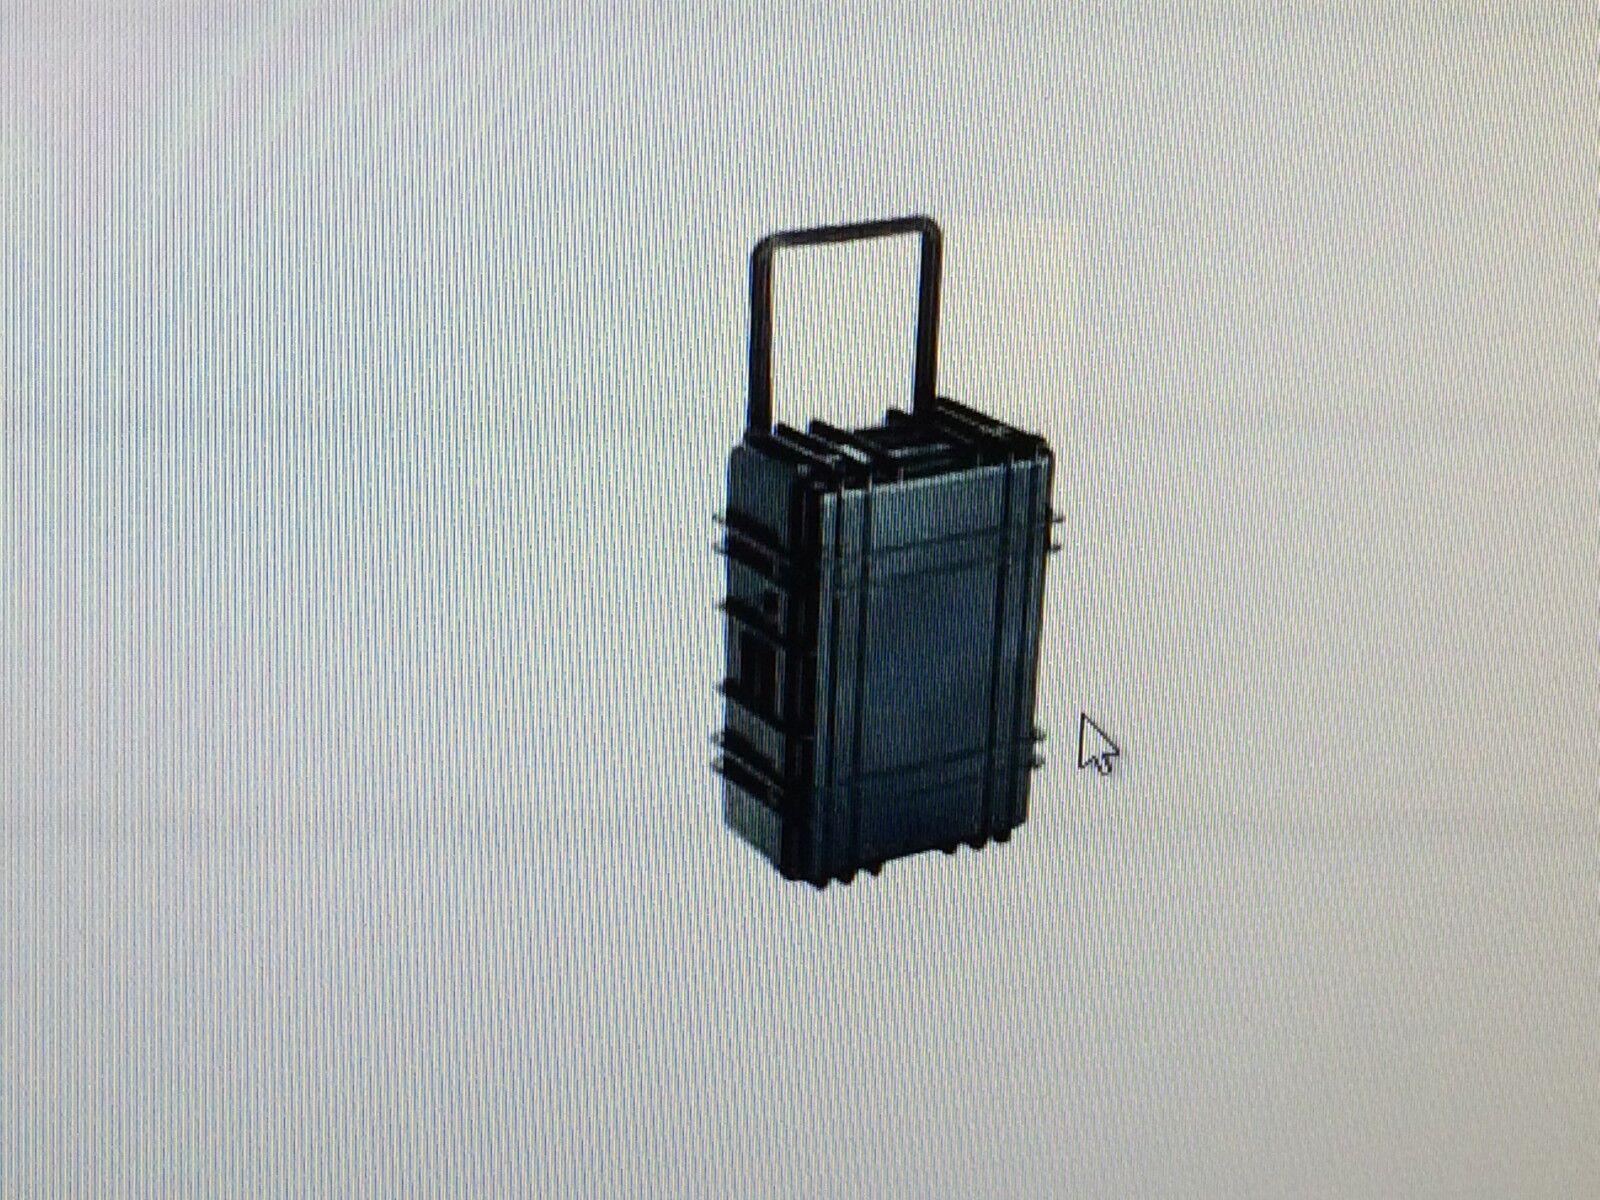 Étanche valise uk uk uk loadout Case 1322-vide 64e64f